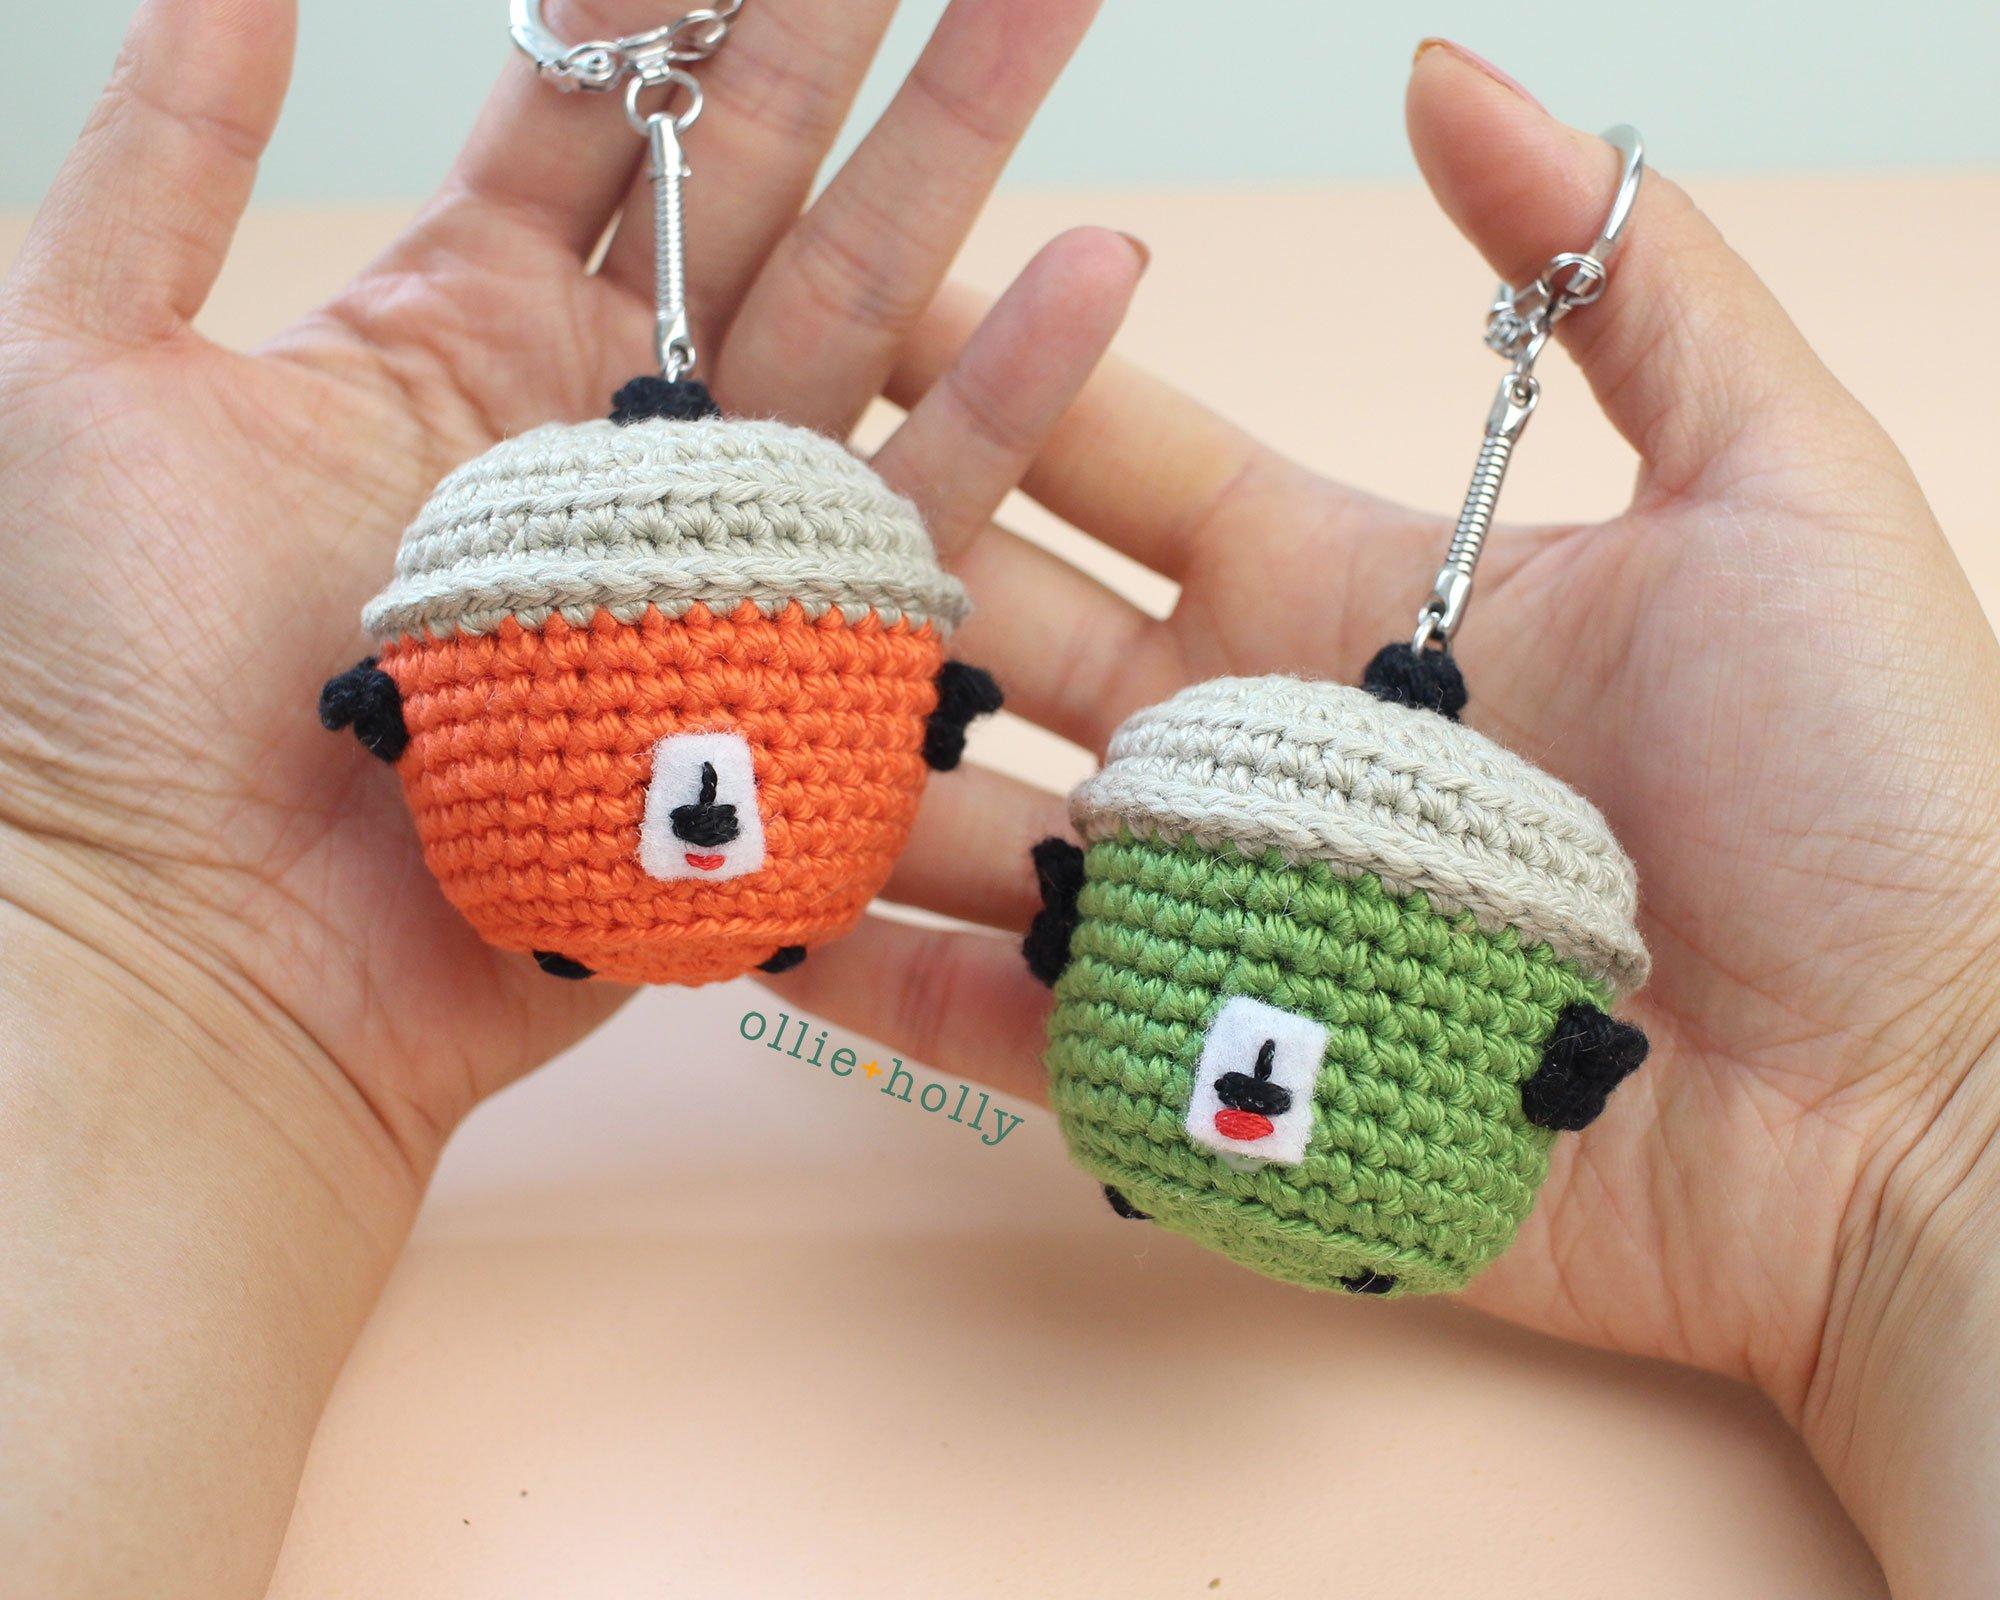 Free Taiwan Tatung Rice Cooker Amigurumi Keychain/Ornament Crochet Pattern Keychain